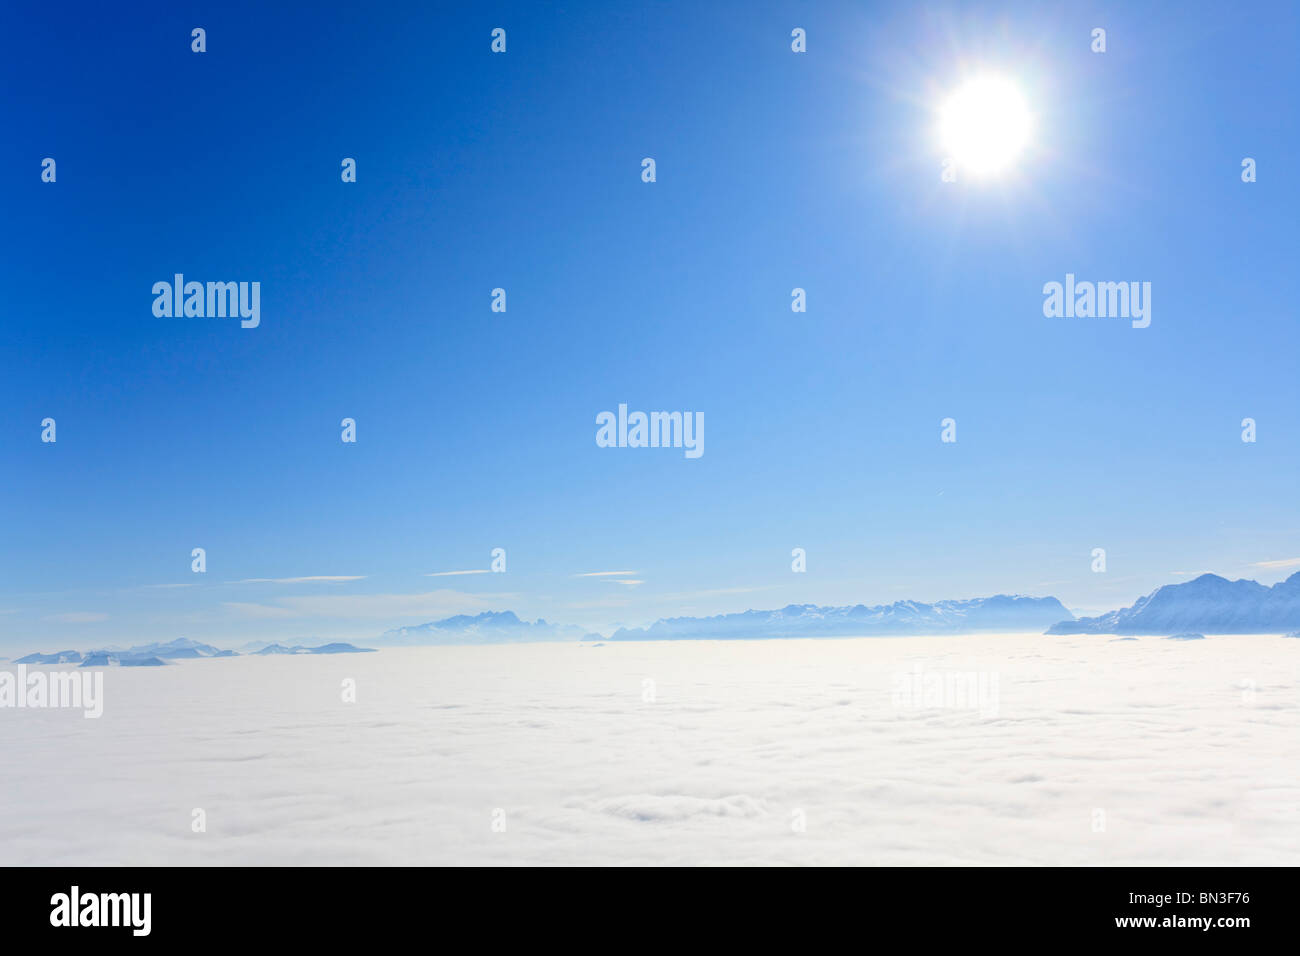 Nebel über dem Salzachtal, Salzburger Land, Österreich Stockbild